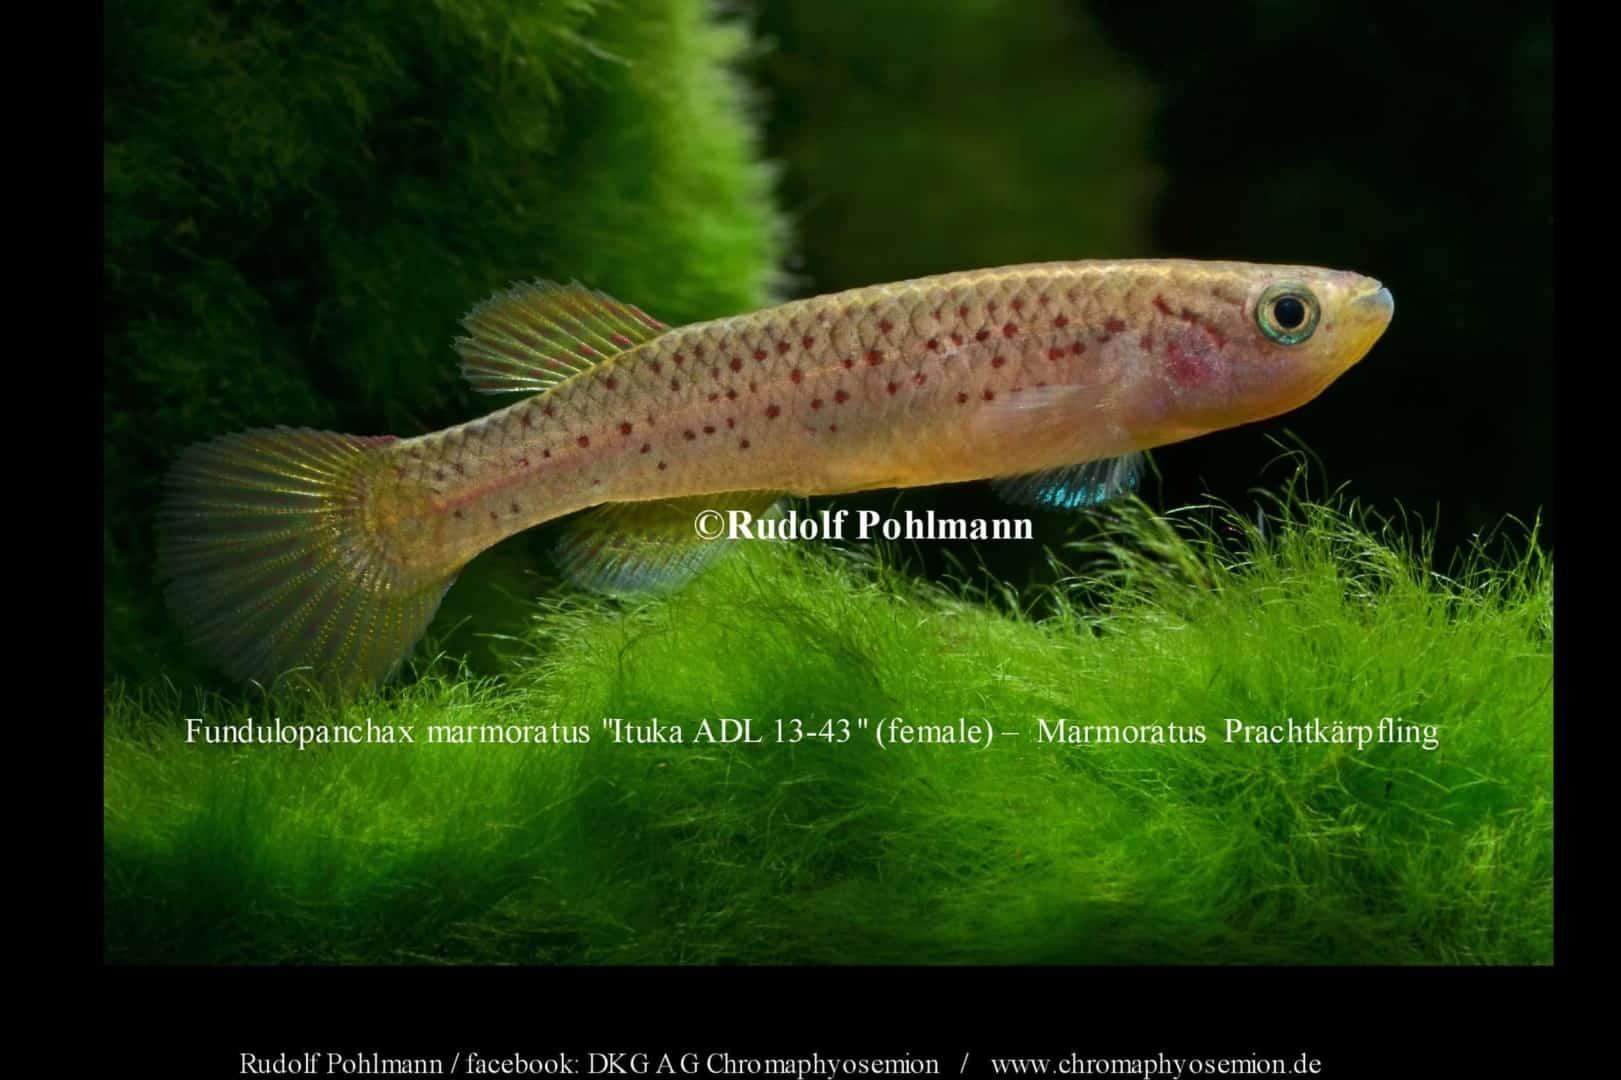 Fundulopanchax marmoratus – Marmoratus Prachtkärpfling 1